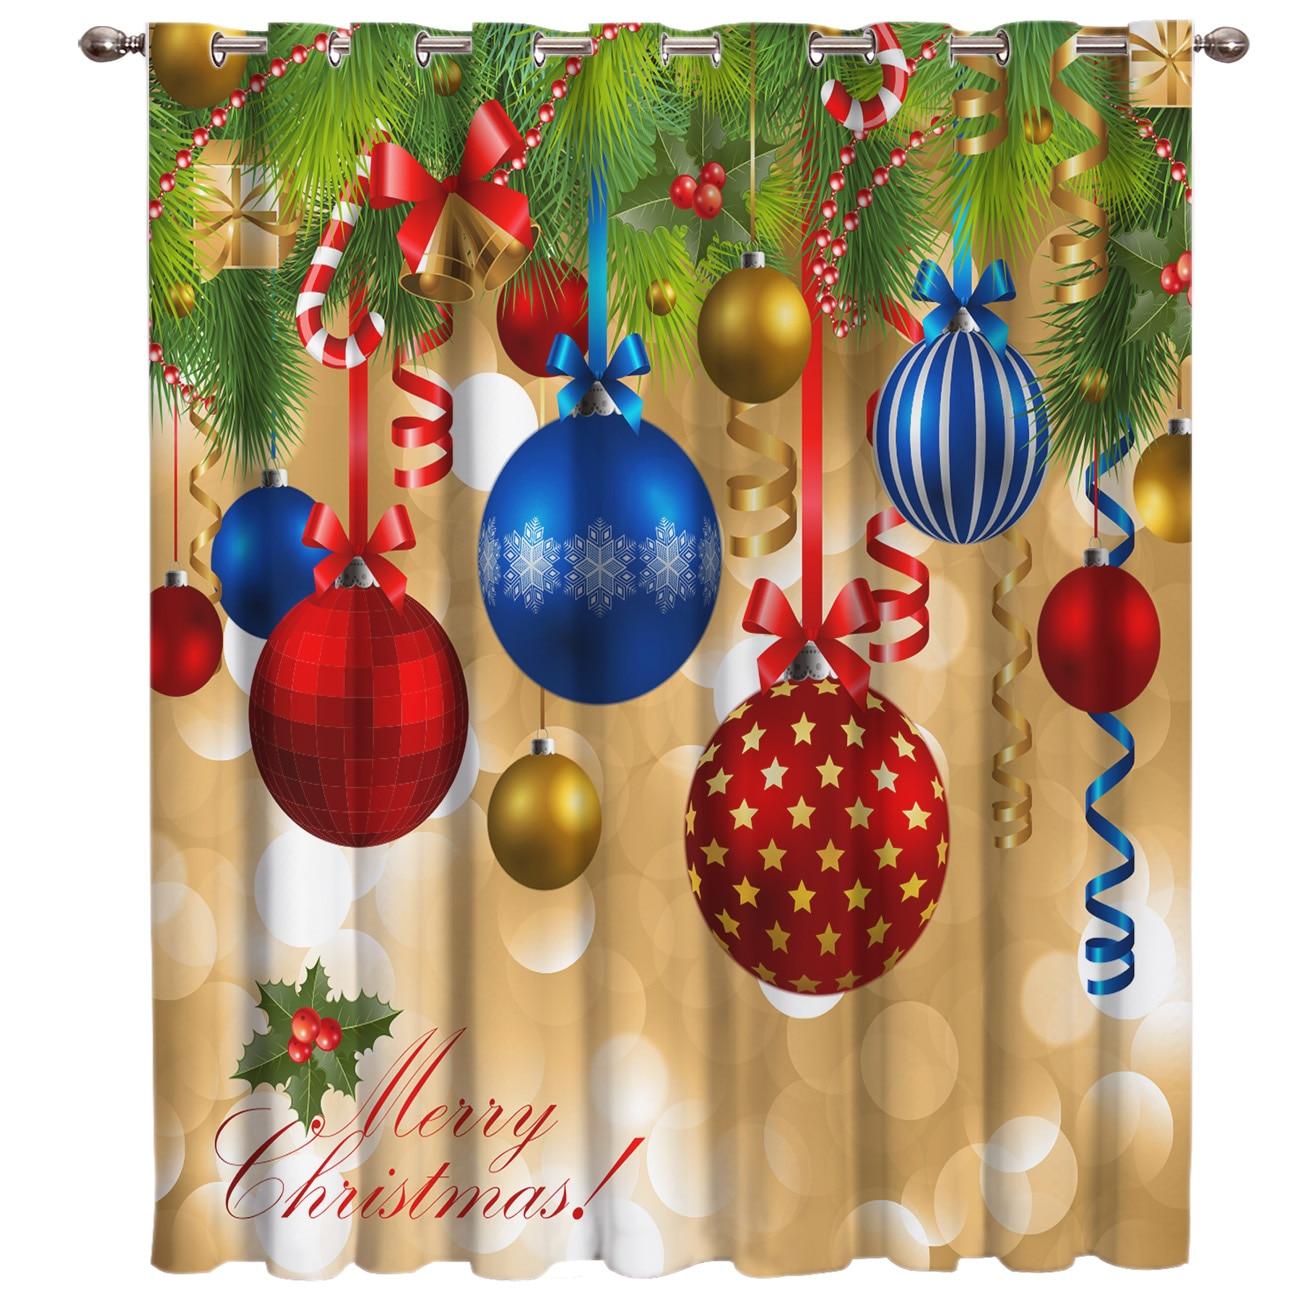 Merry Christmas Tree Decor Window Curtains Dark Living Room Blackout Kitchen Drapes Print Window Treatment Hardware Sets Window